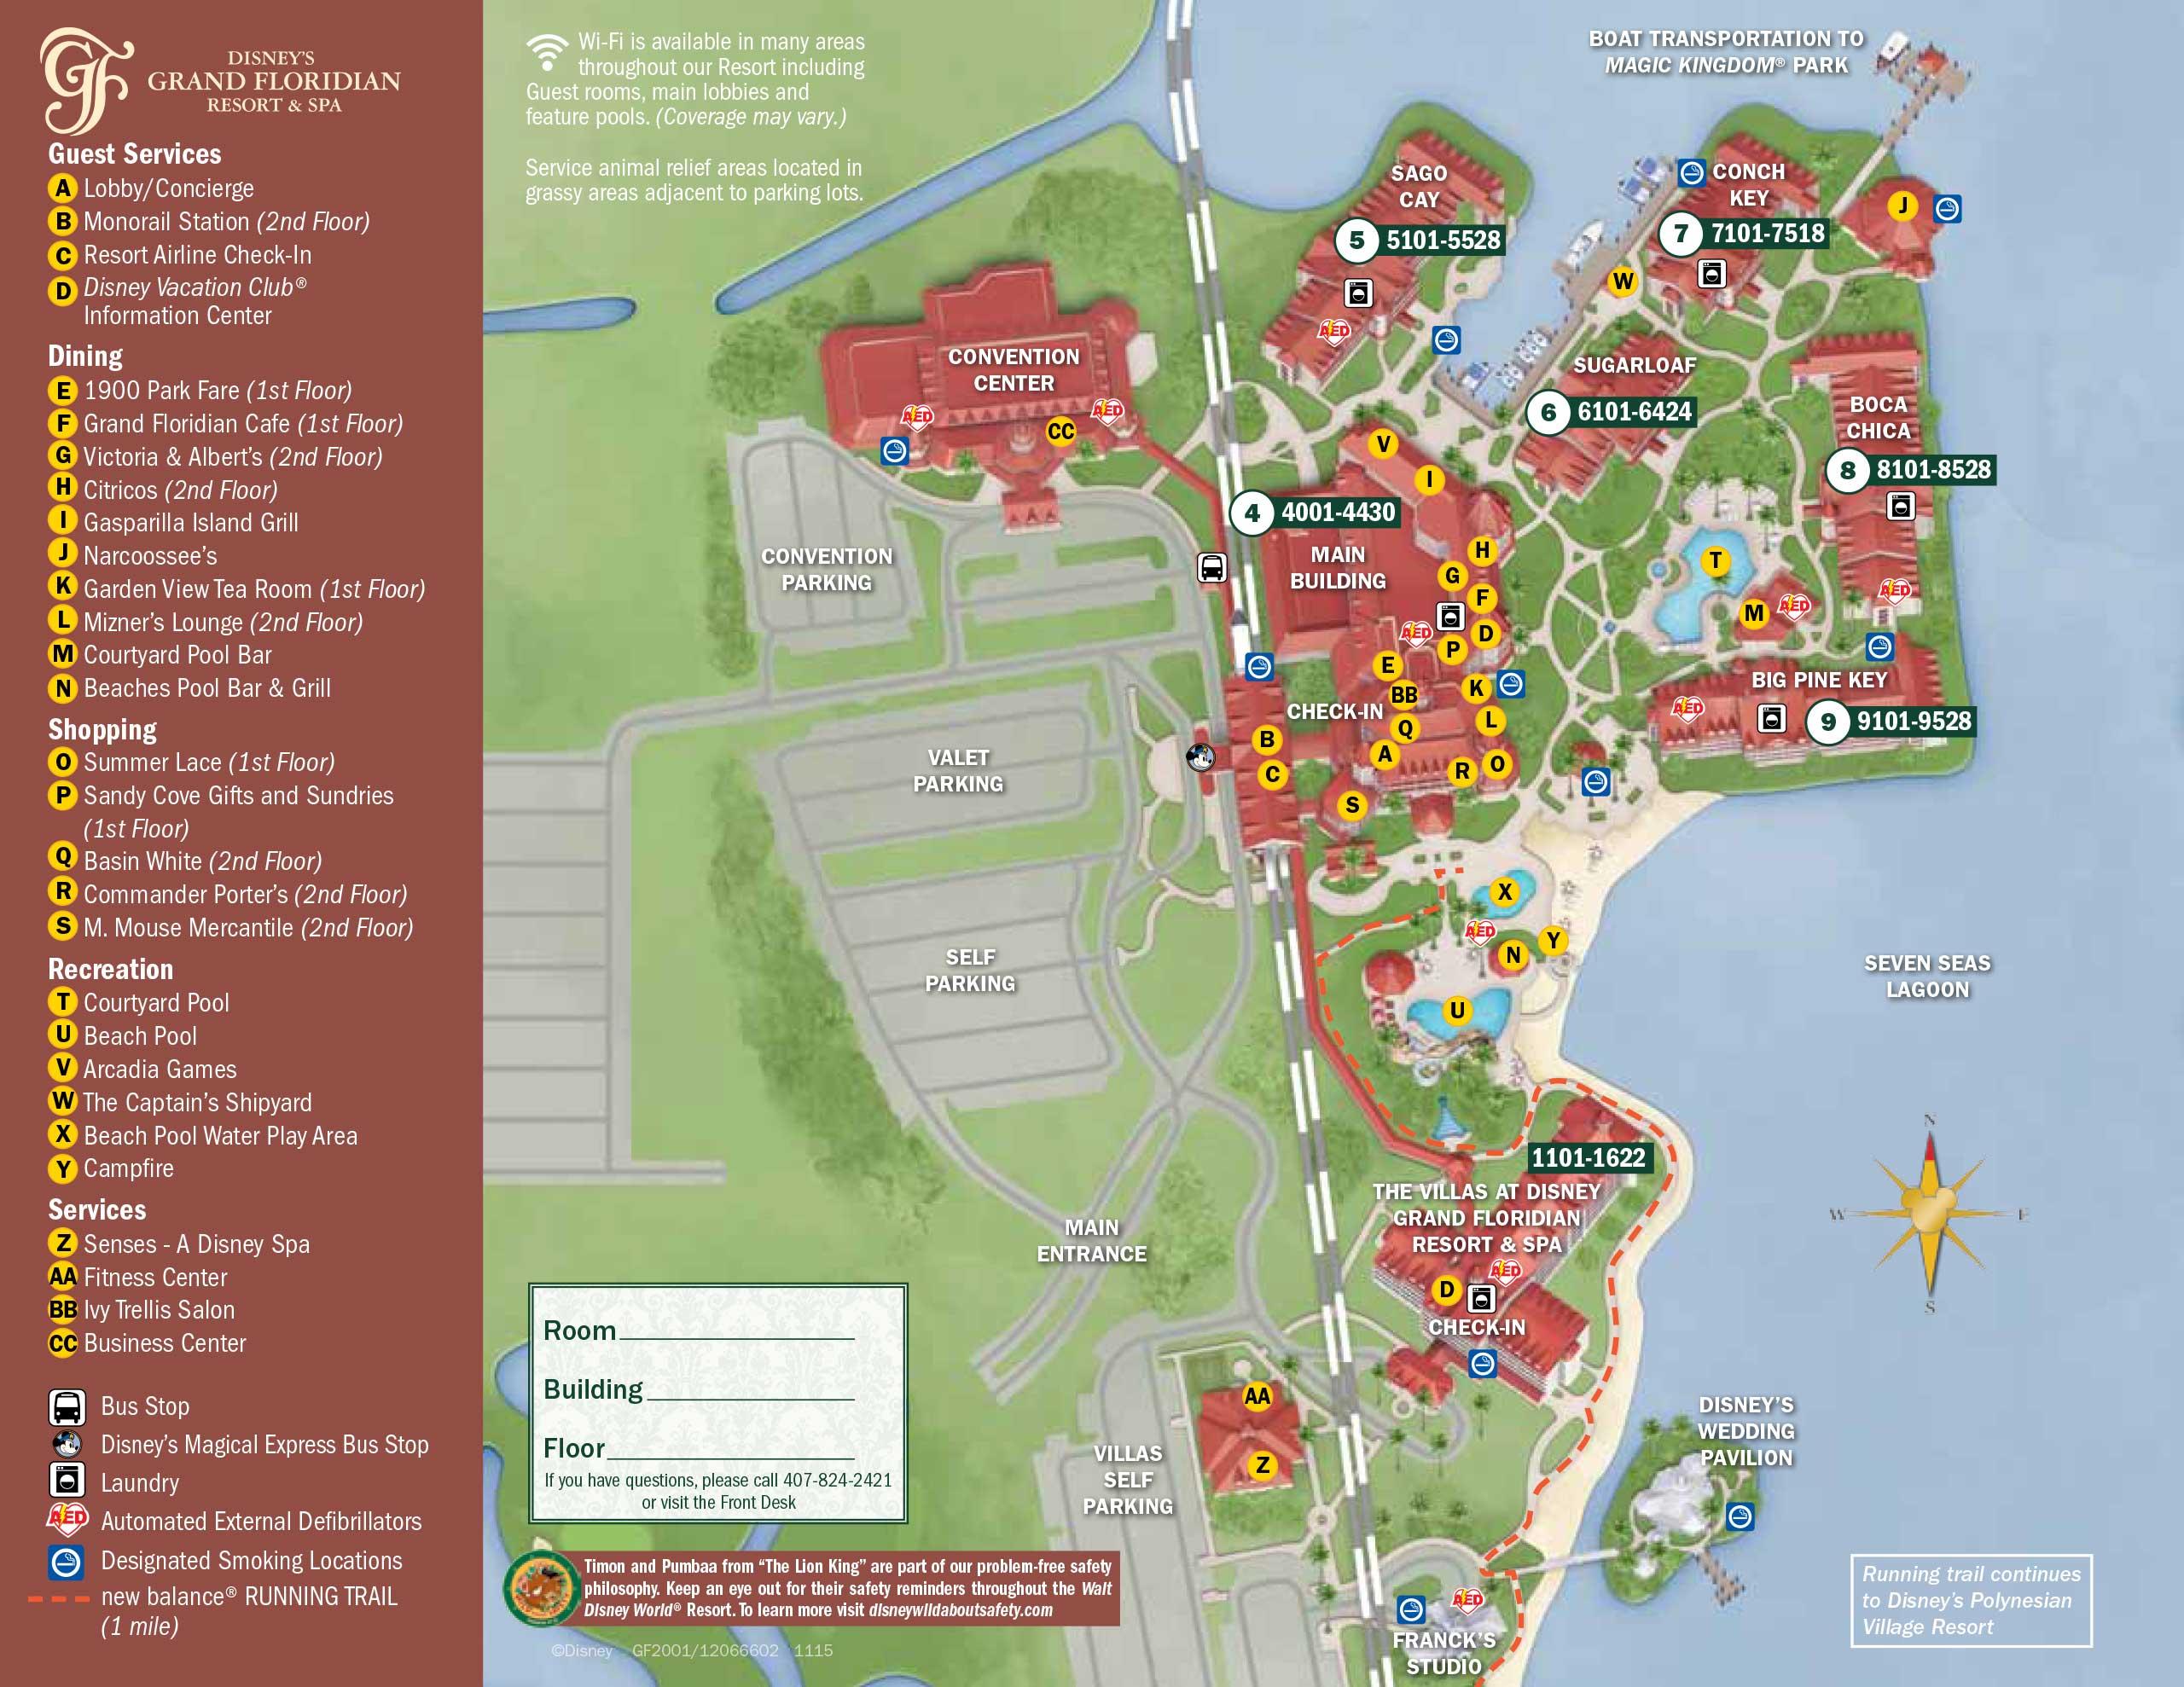 Walt Disney World Map With Hotels.April 2017 Walt Disney World Resort Hotel Maps Photo 25 Of 33